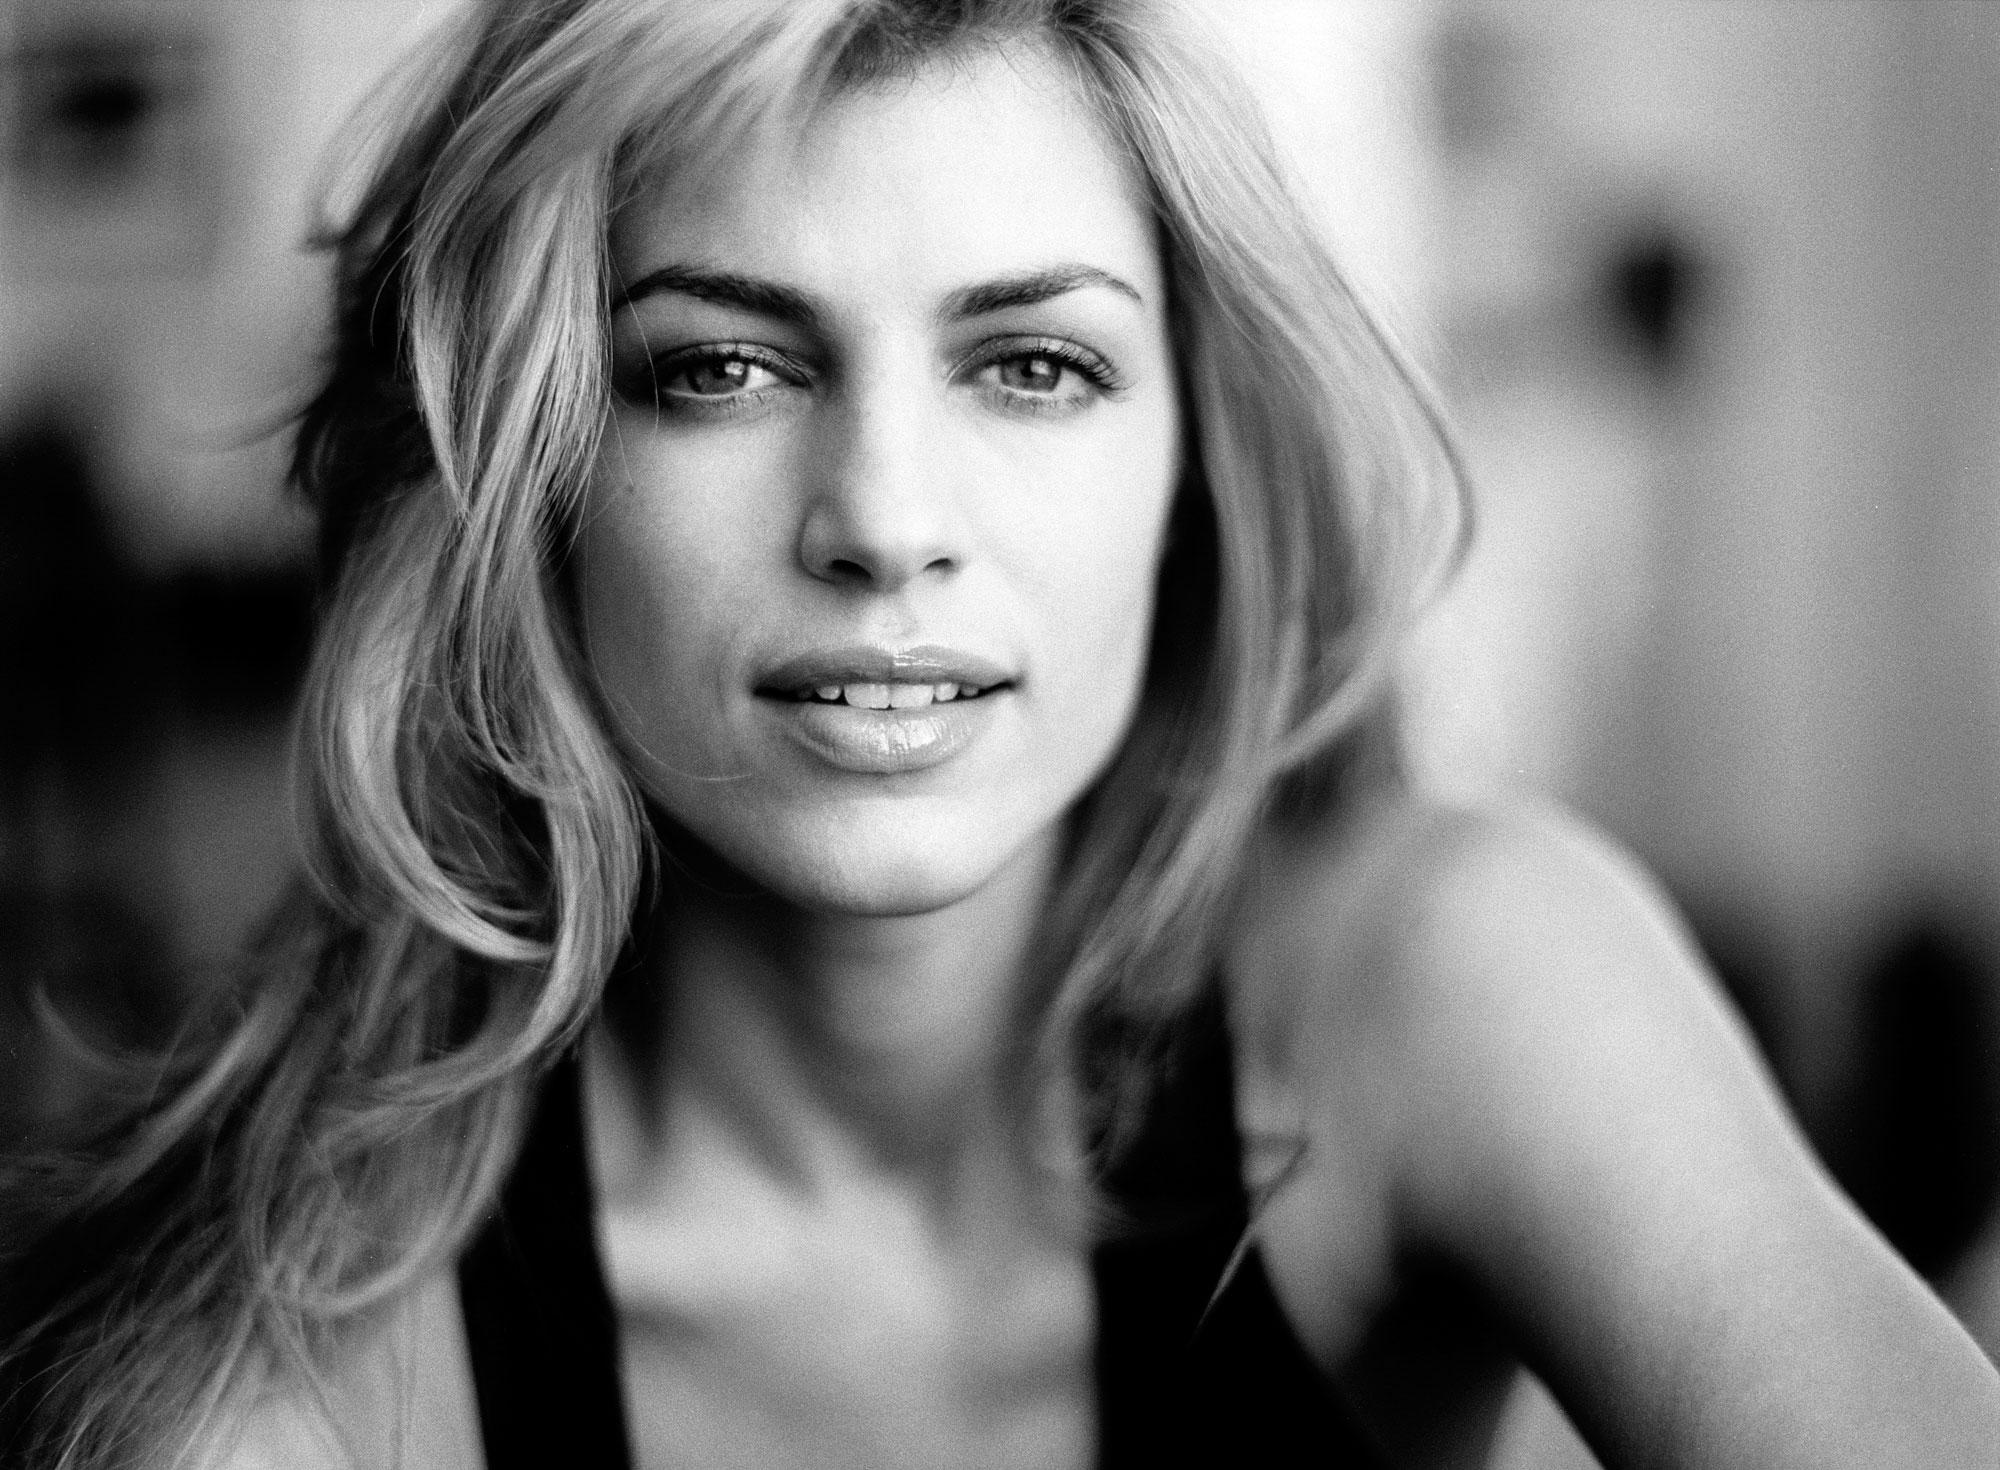 Daniela-INT-windw_smile2-BW1